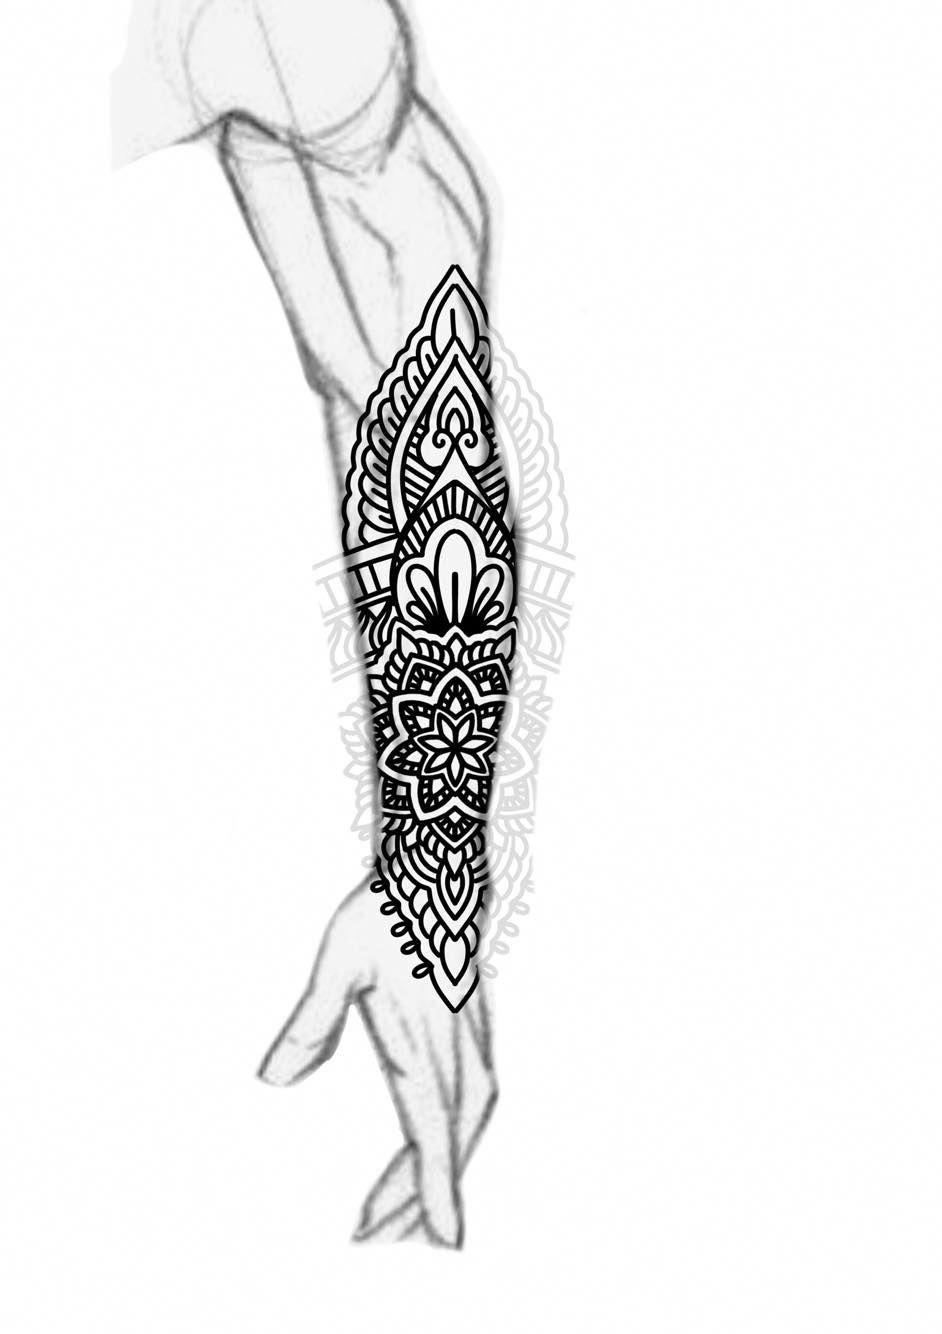 Maori Tattoos Betekenis Maoritattoos Maori Tattoos